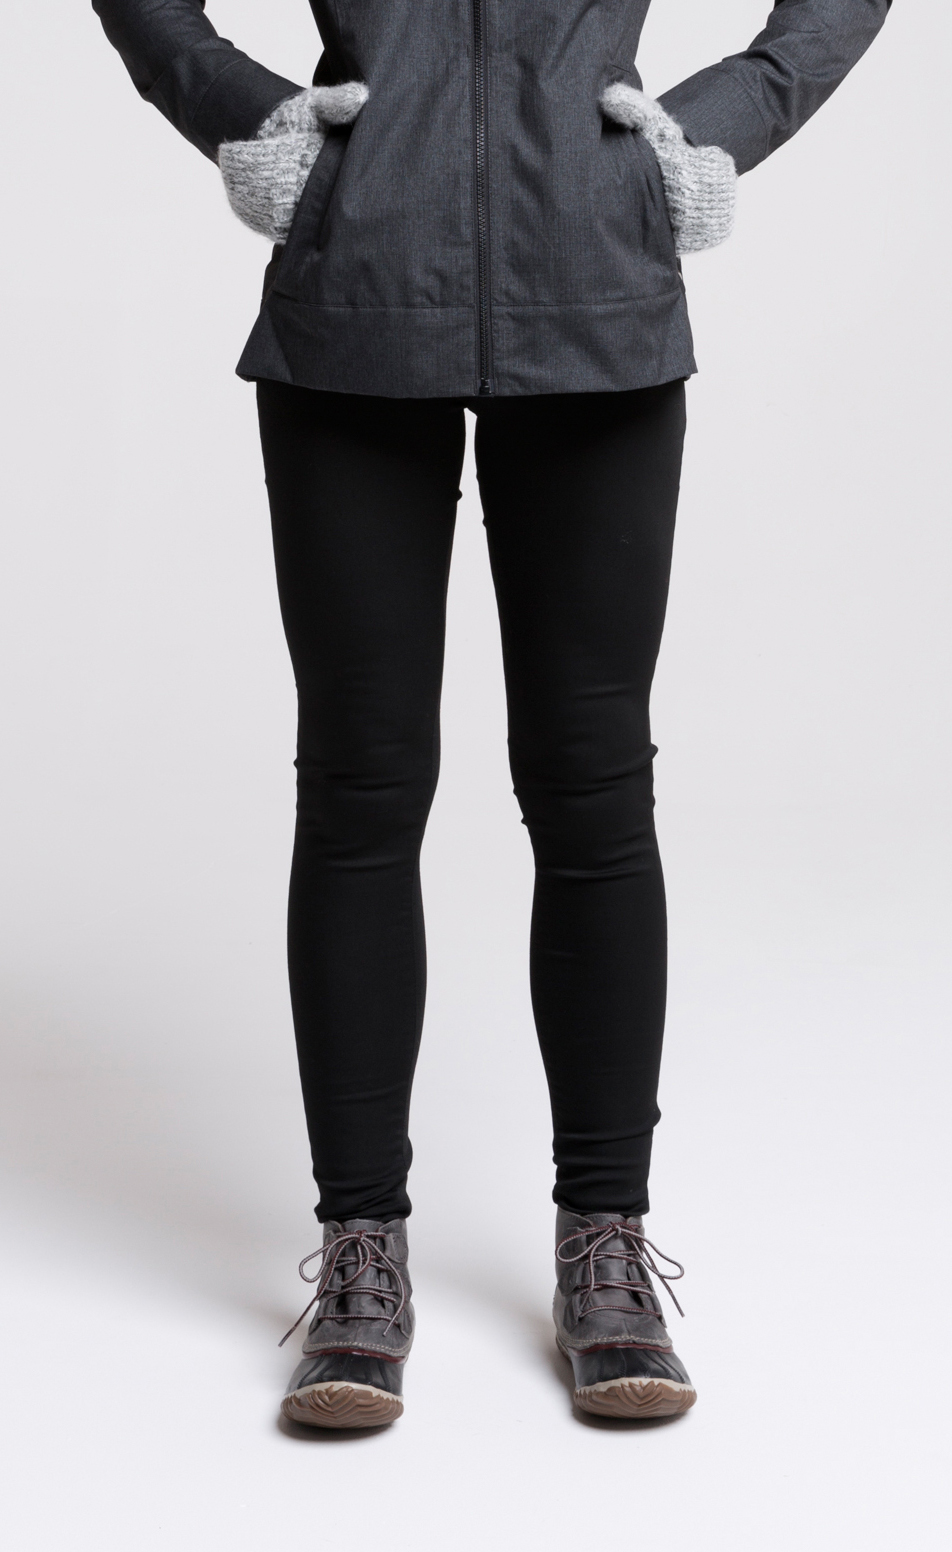 73ce13658cc Dish Skinny Jeans - Women's | MEC